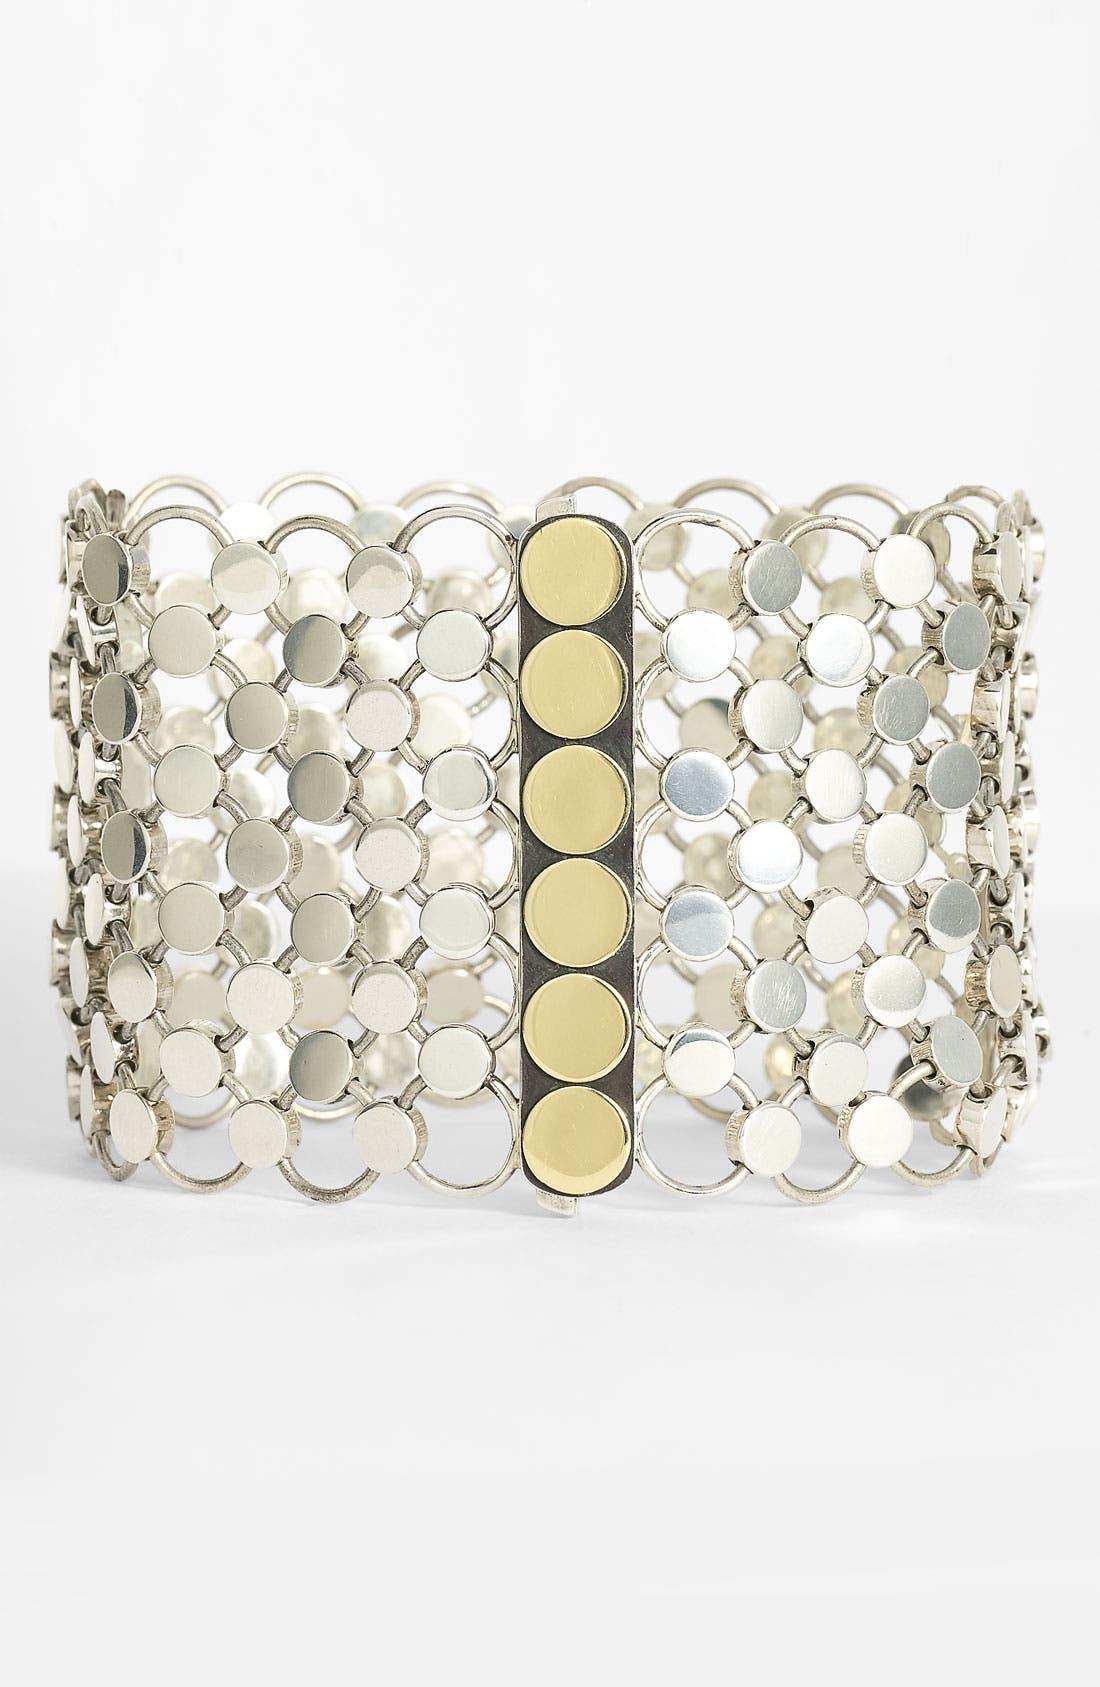 Main Image - John Hardy 'Dot' Wide Linked Bracelet